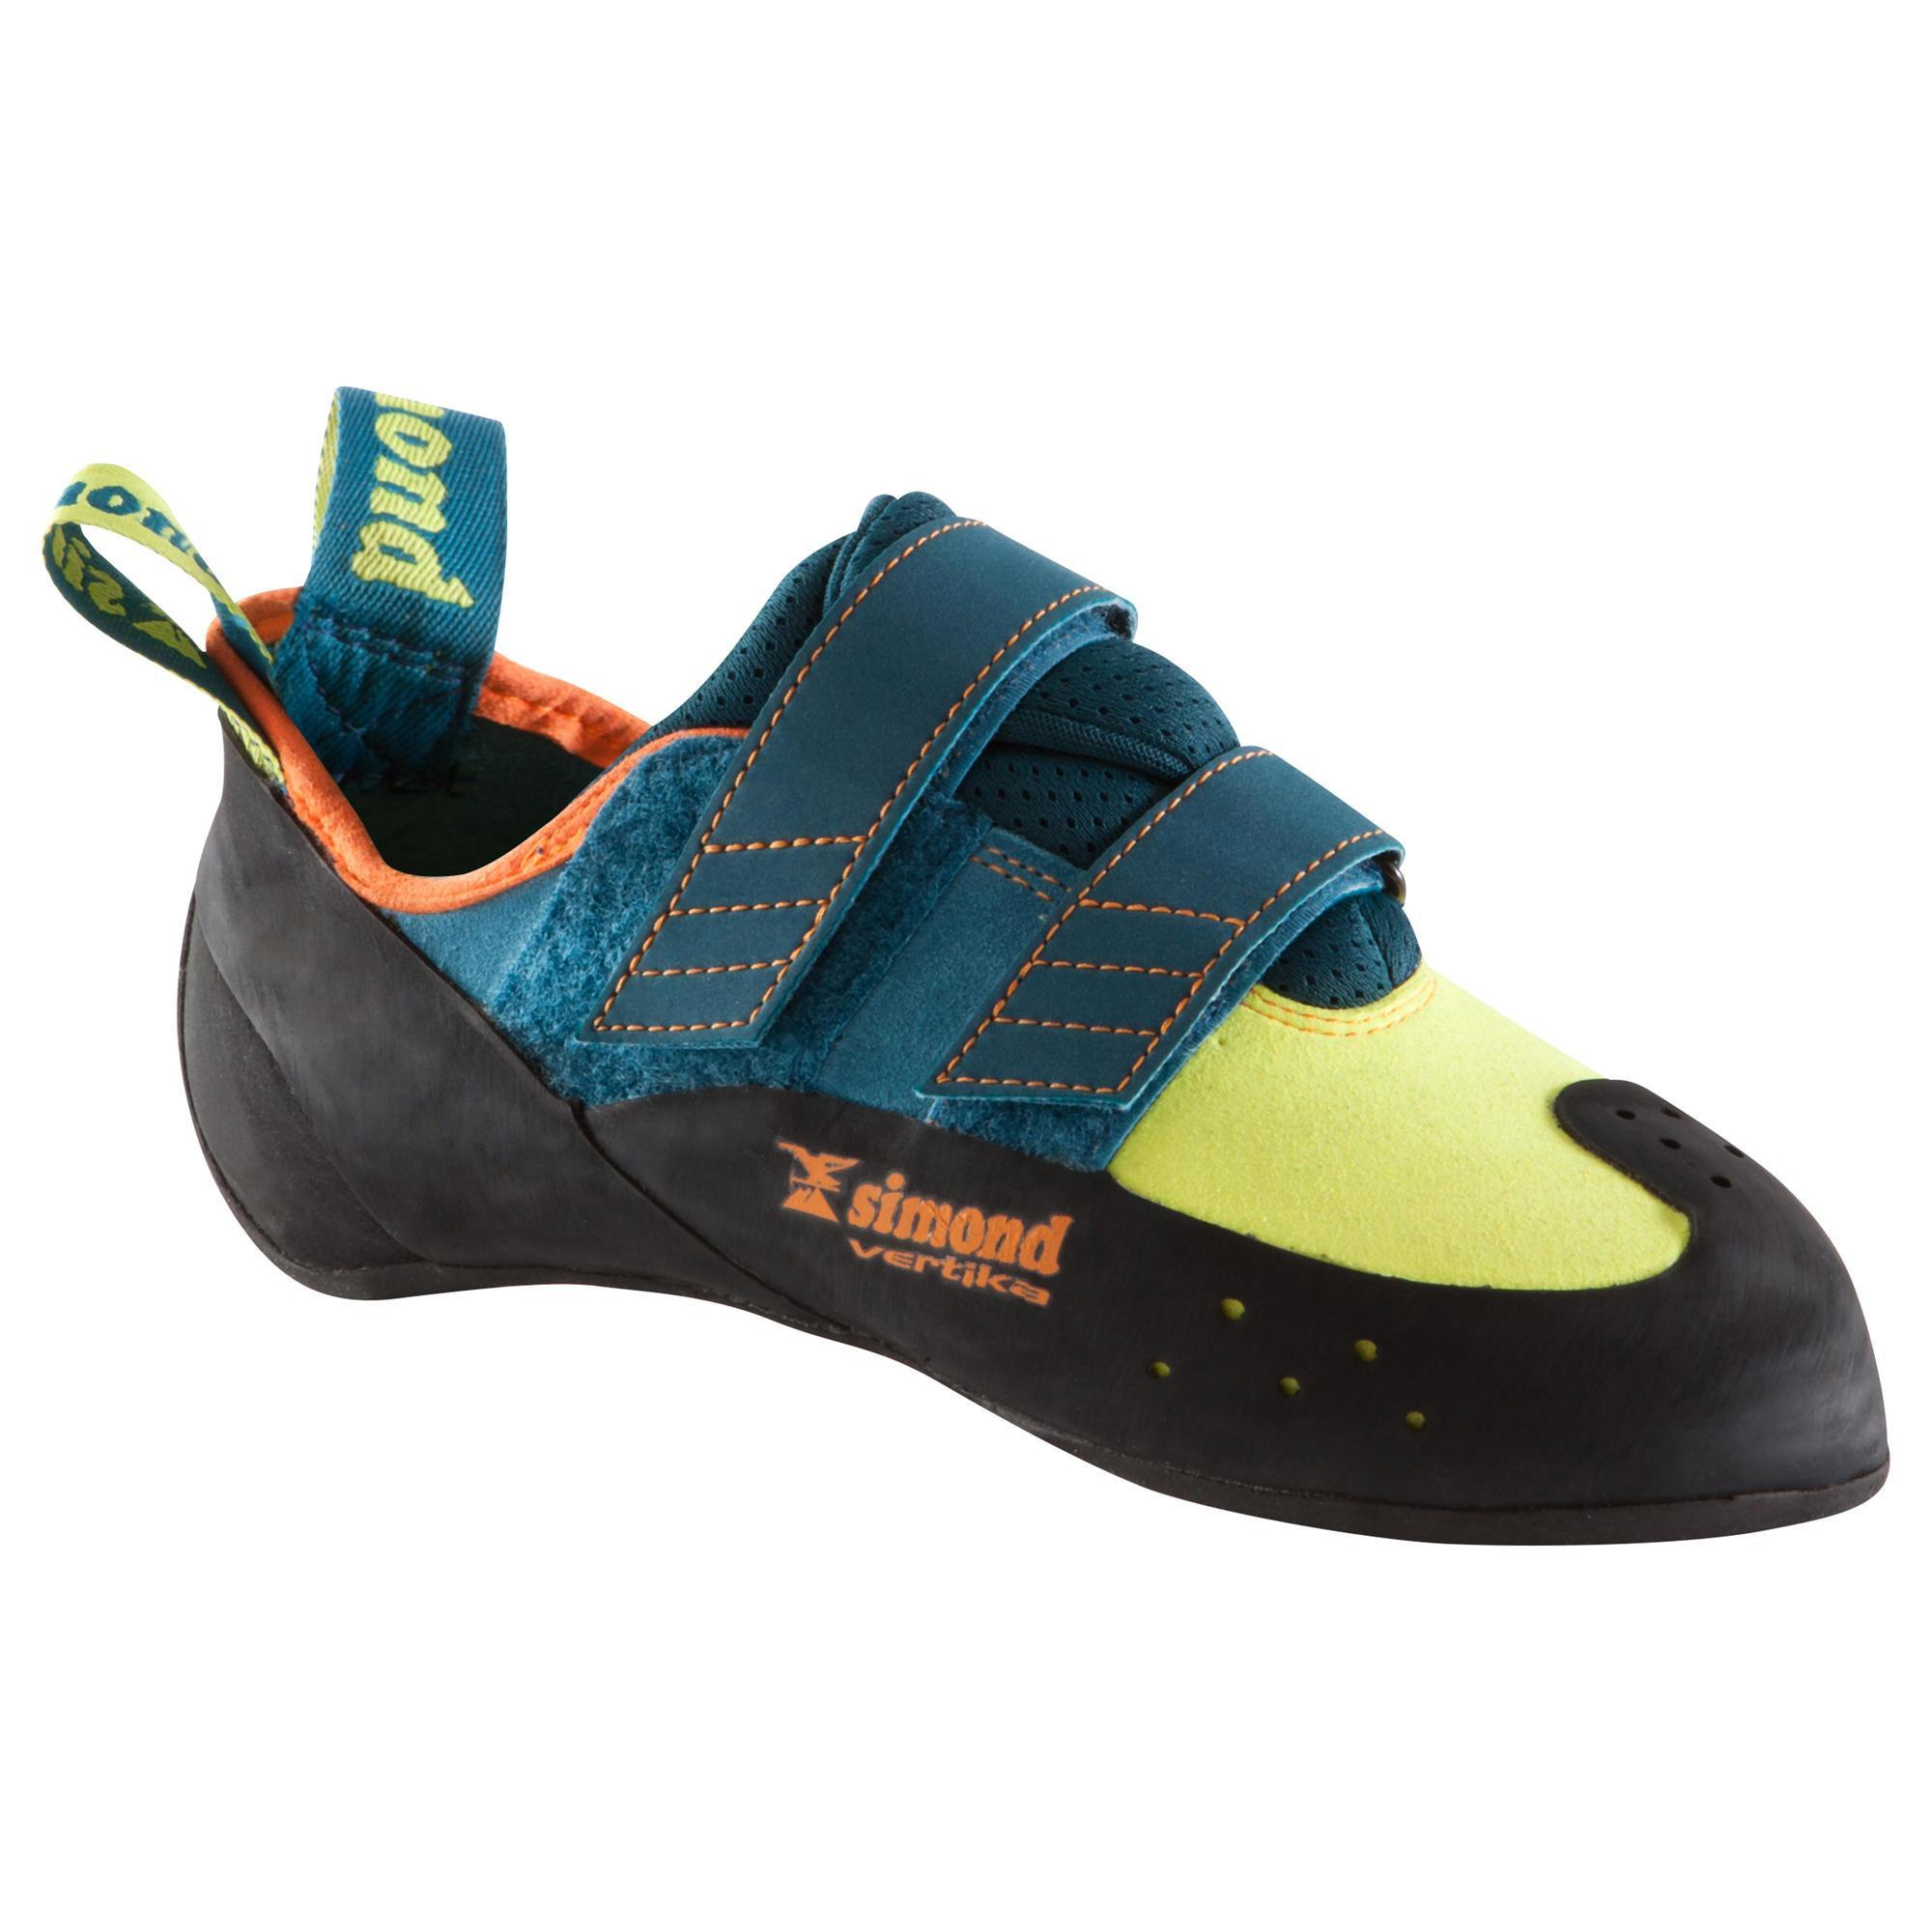 Kletterschuhe Vertika | Schuhe > Sportschuhe > Kletterschuhe | Blau - Türkis - Grün - Orange | Gummi - Leder | Simond